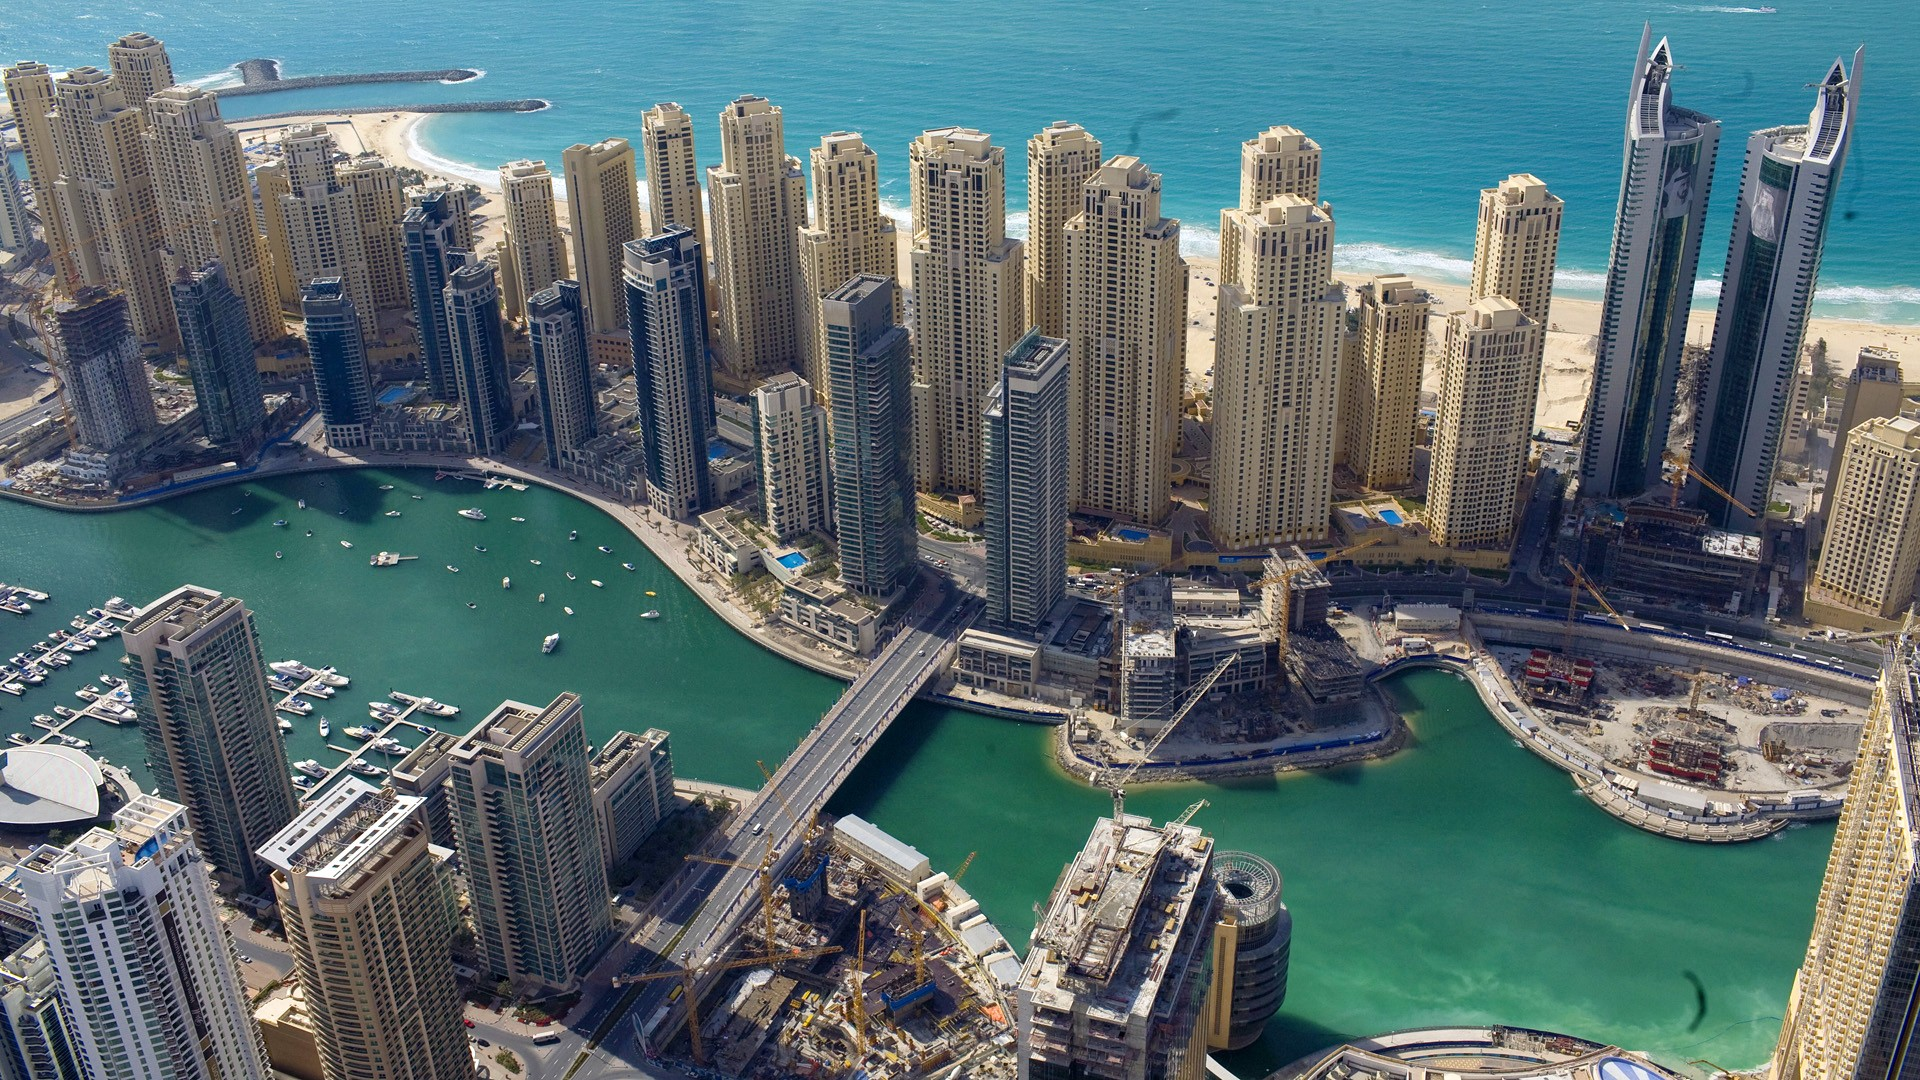 عقارات دبي تواجه خطر الأنهيار مجدداً